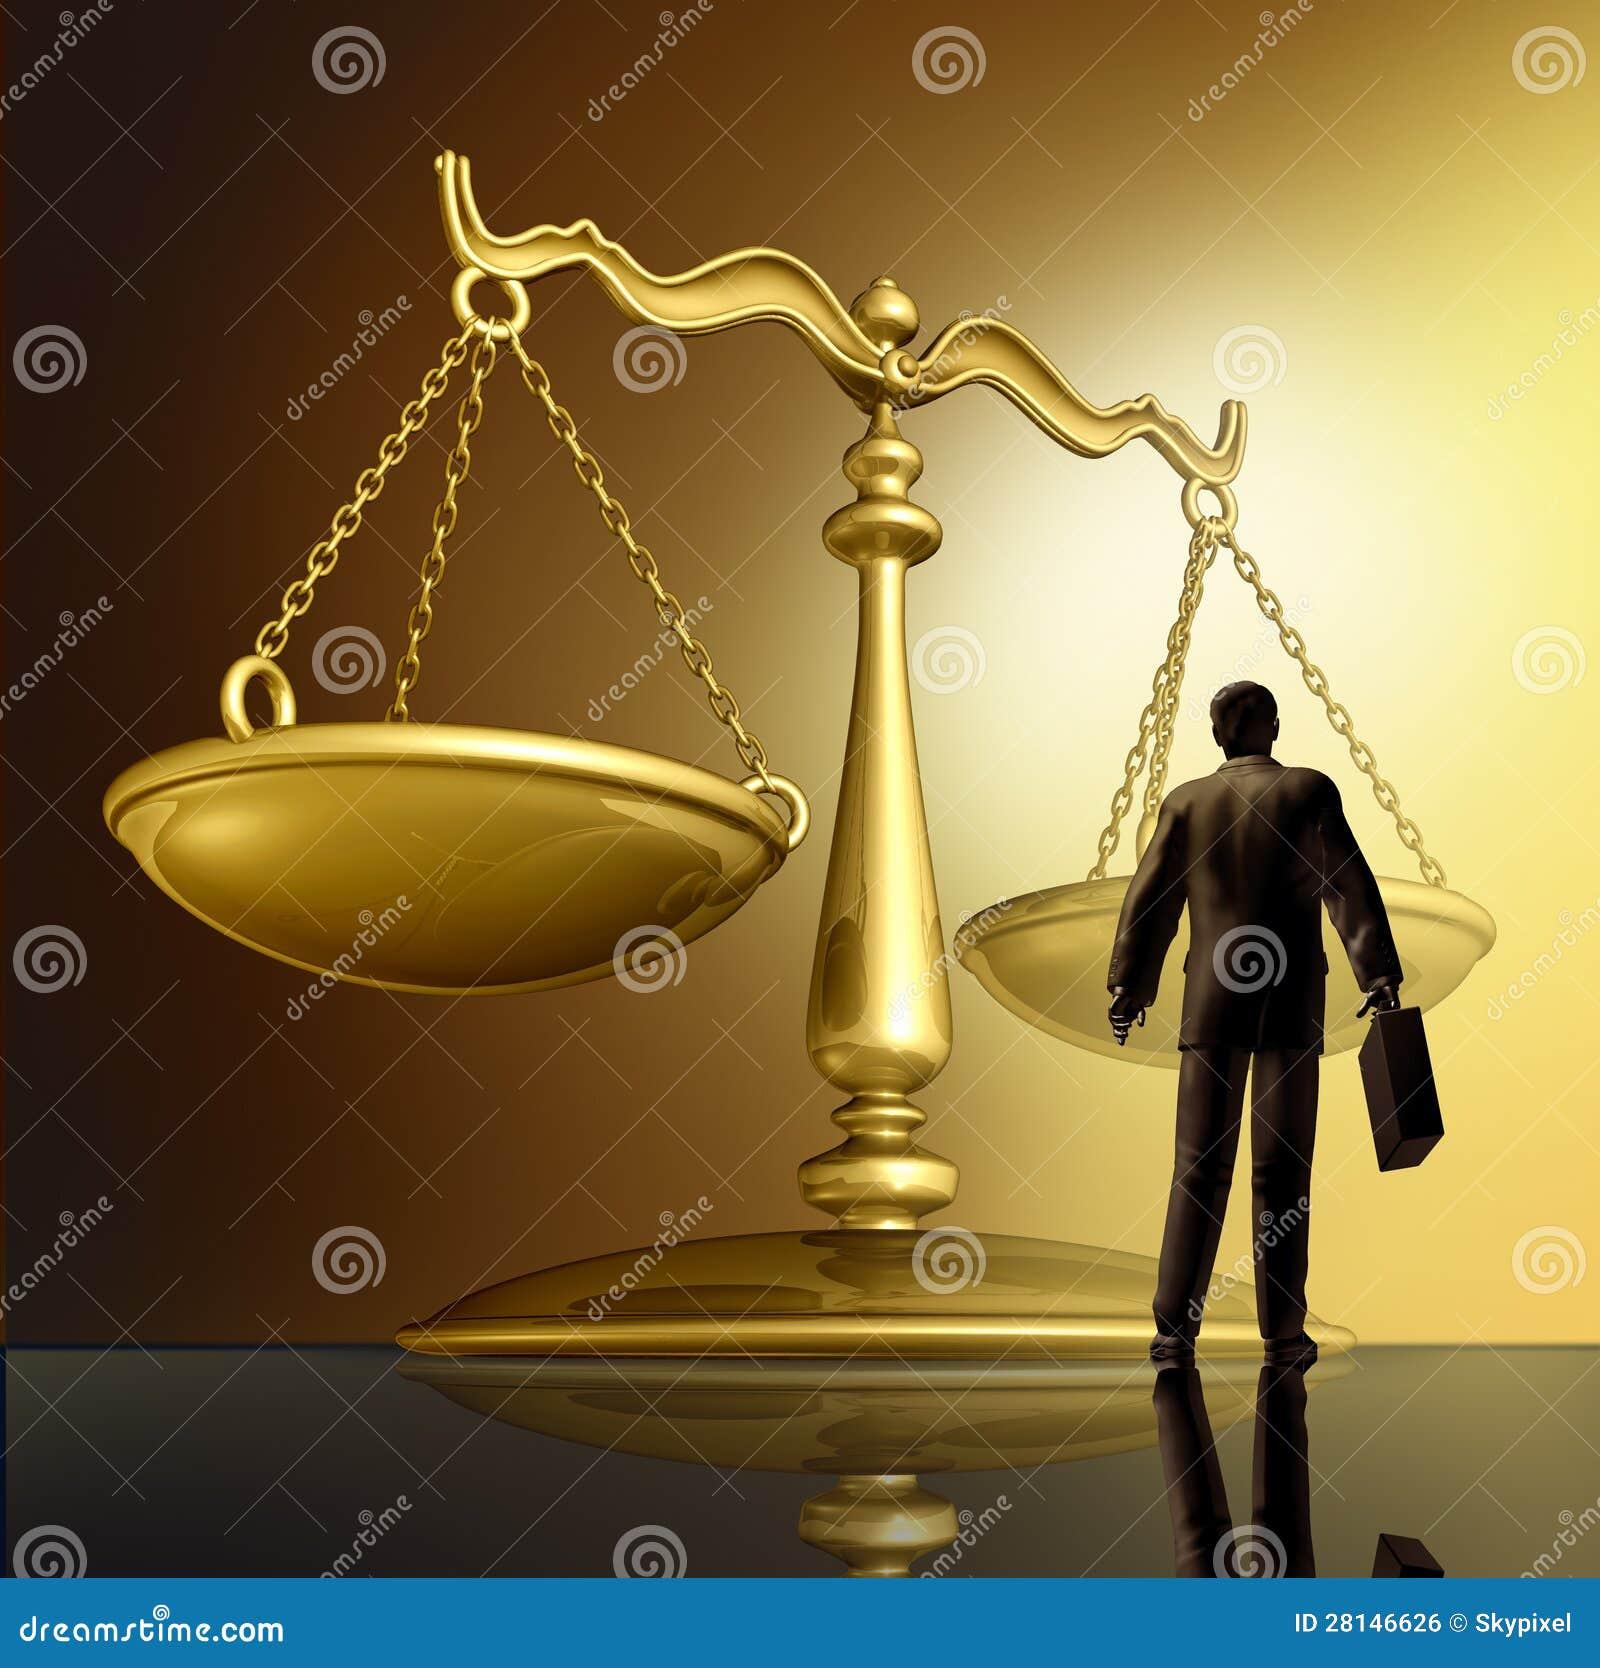 lawyer-law-28146626.jpg